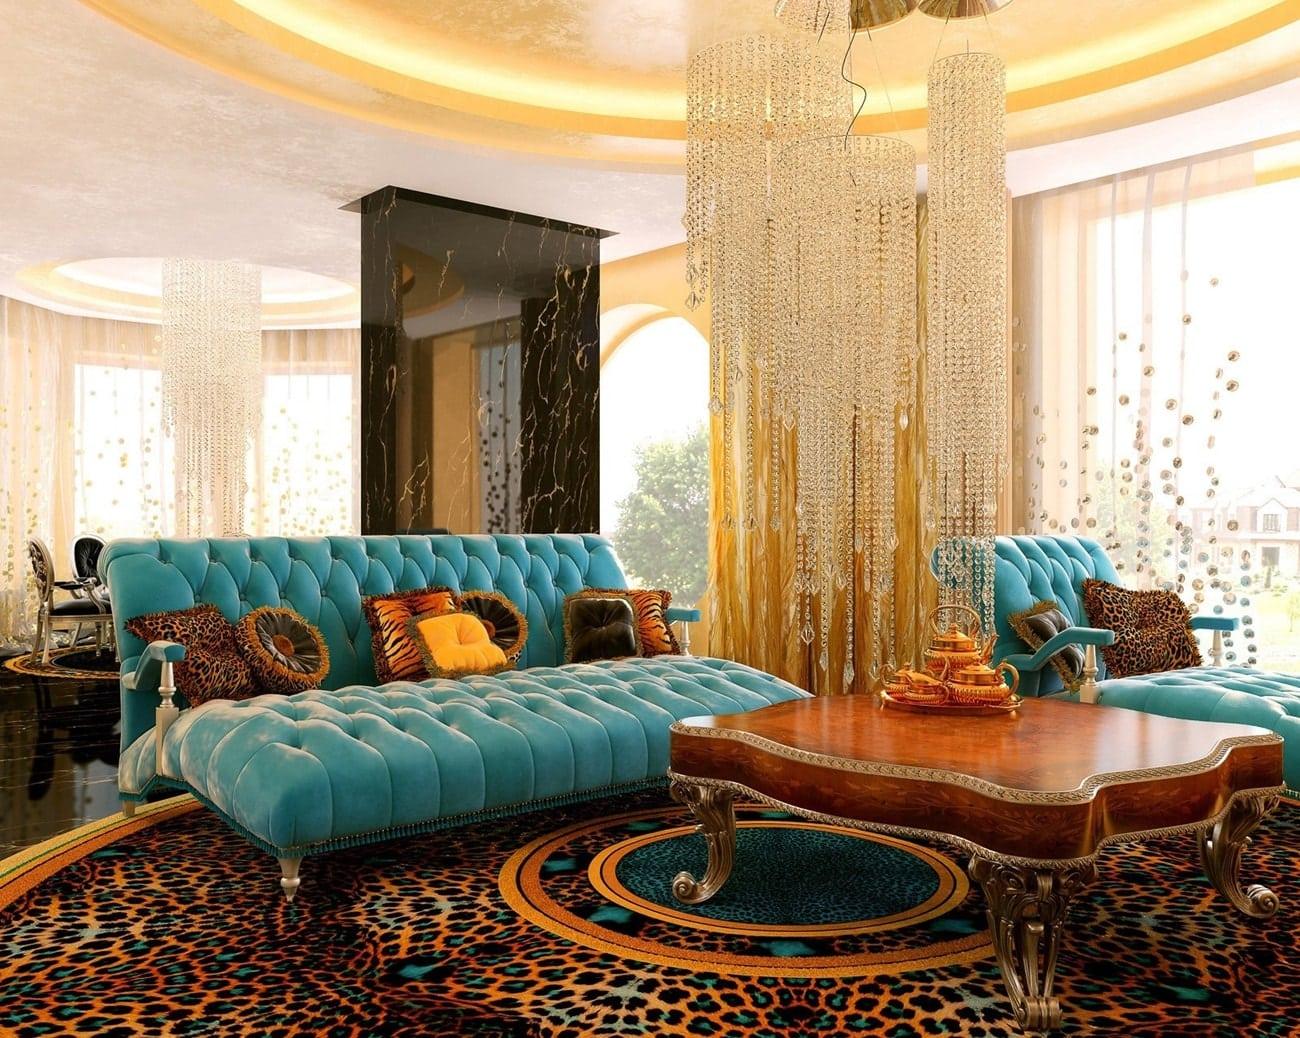 stil art deko v interere - Стили интерьера для маленькой квартиры